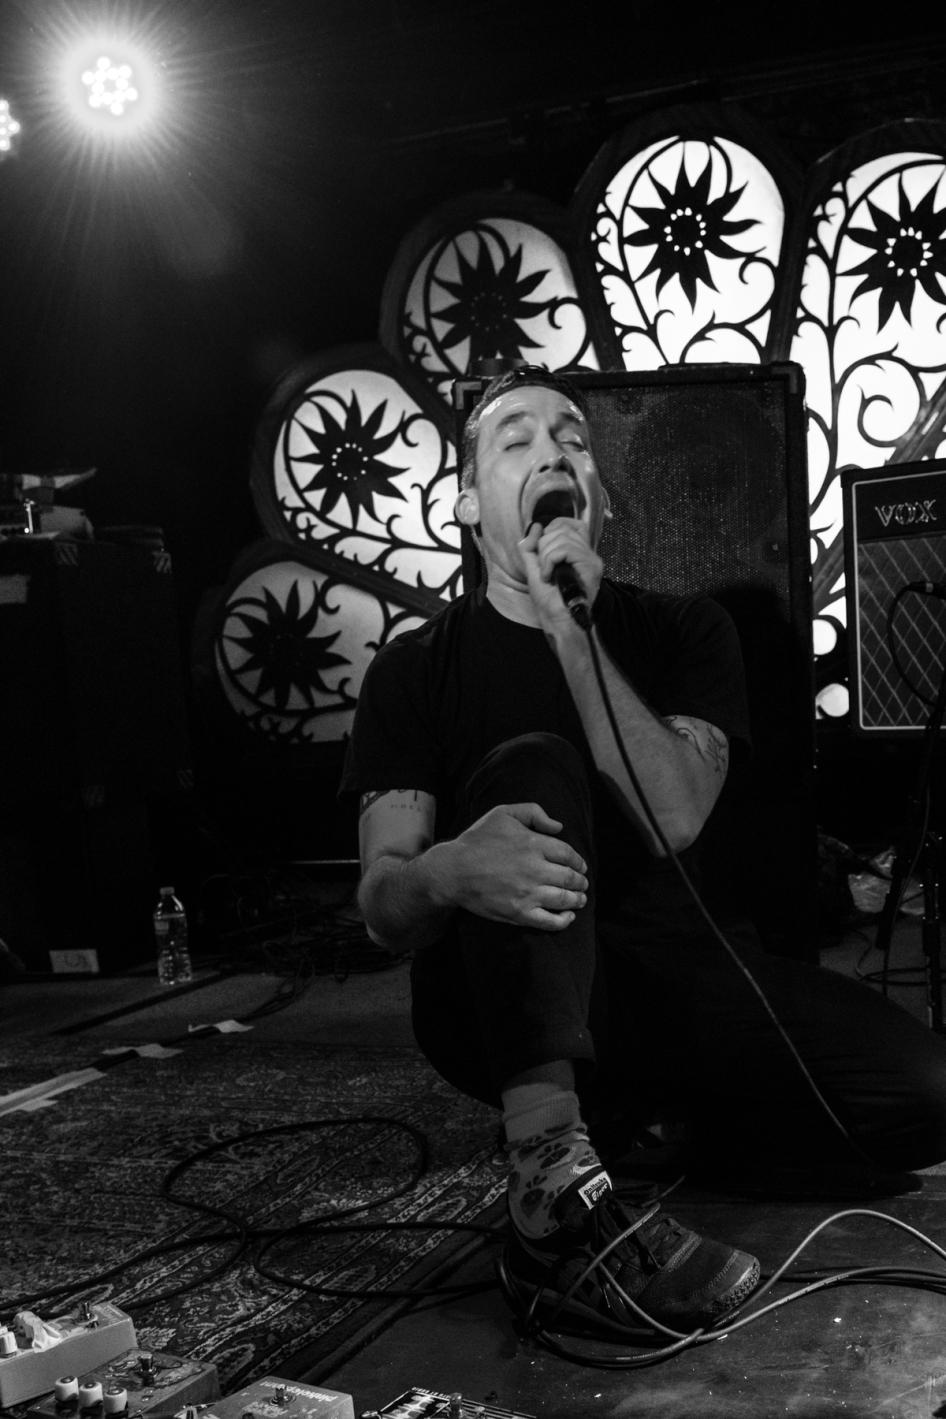 angelo_santoro_livemusicNYC-18